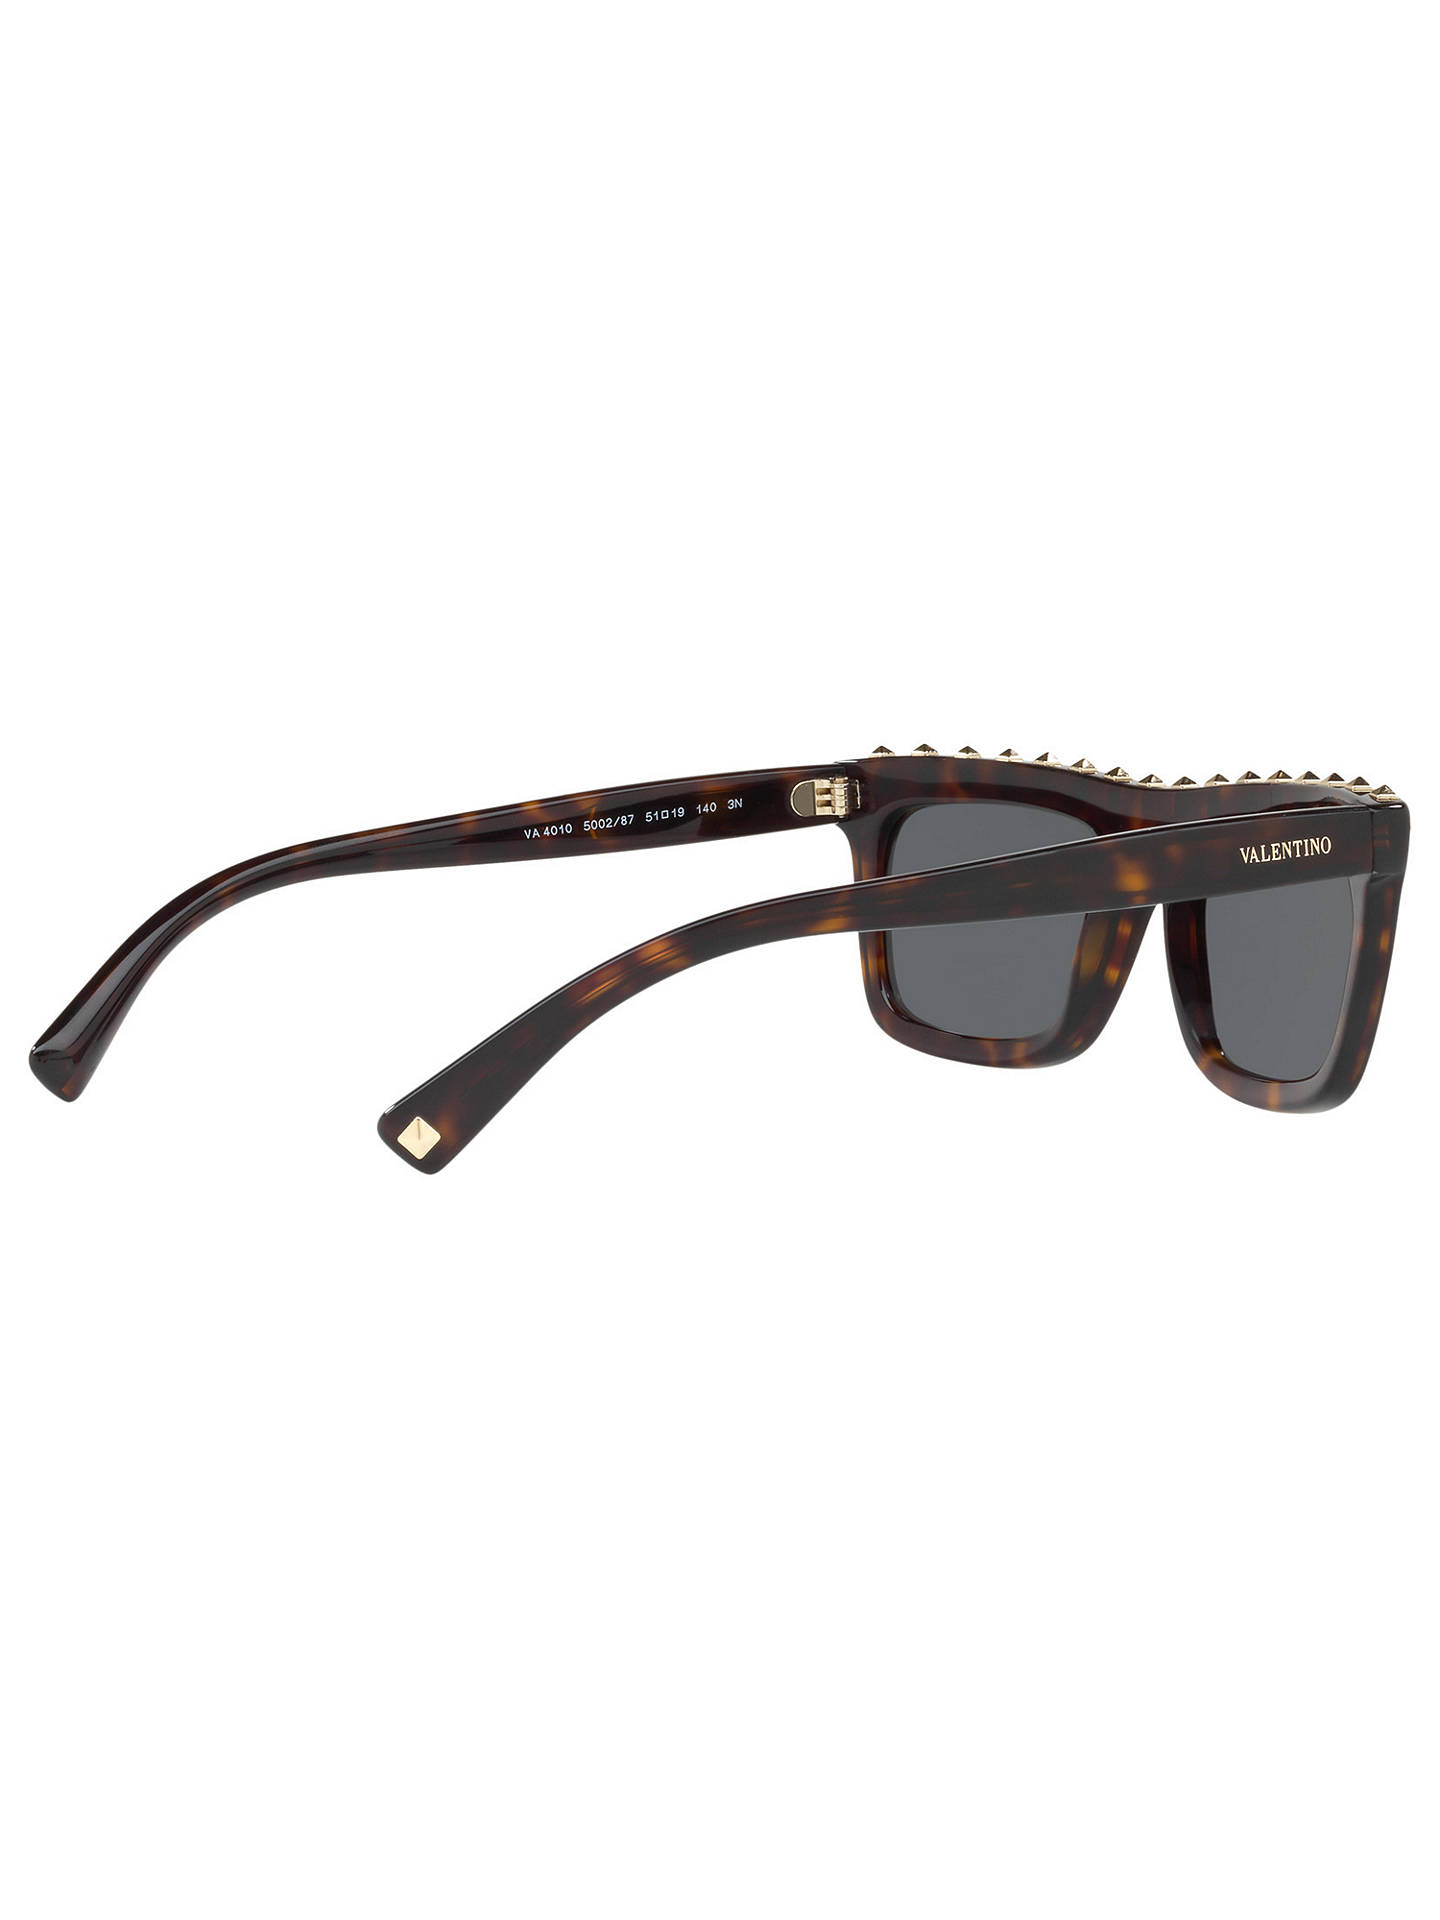 59584a9f99f ... BuyValentino VA4010 Studded Rectangular Sunglasses